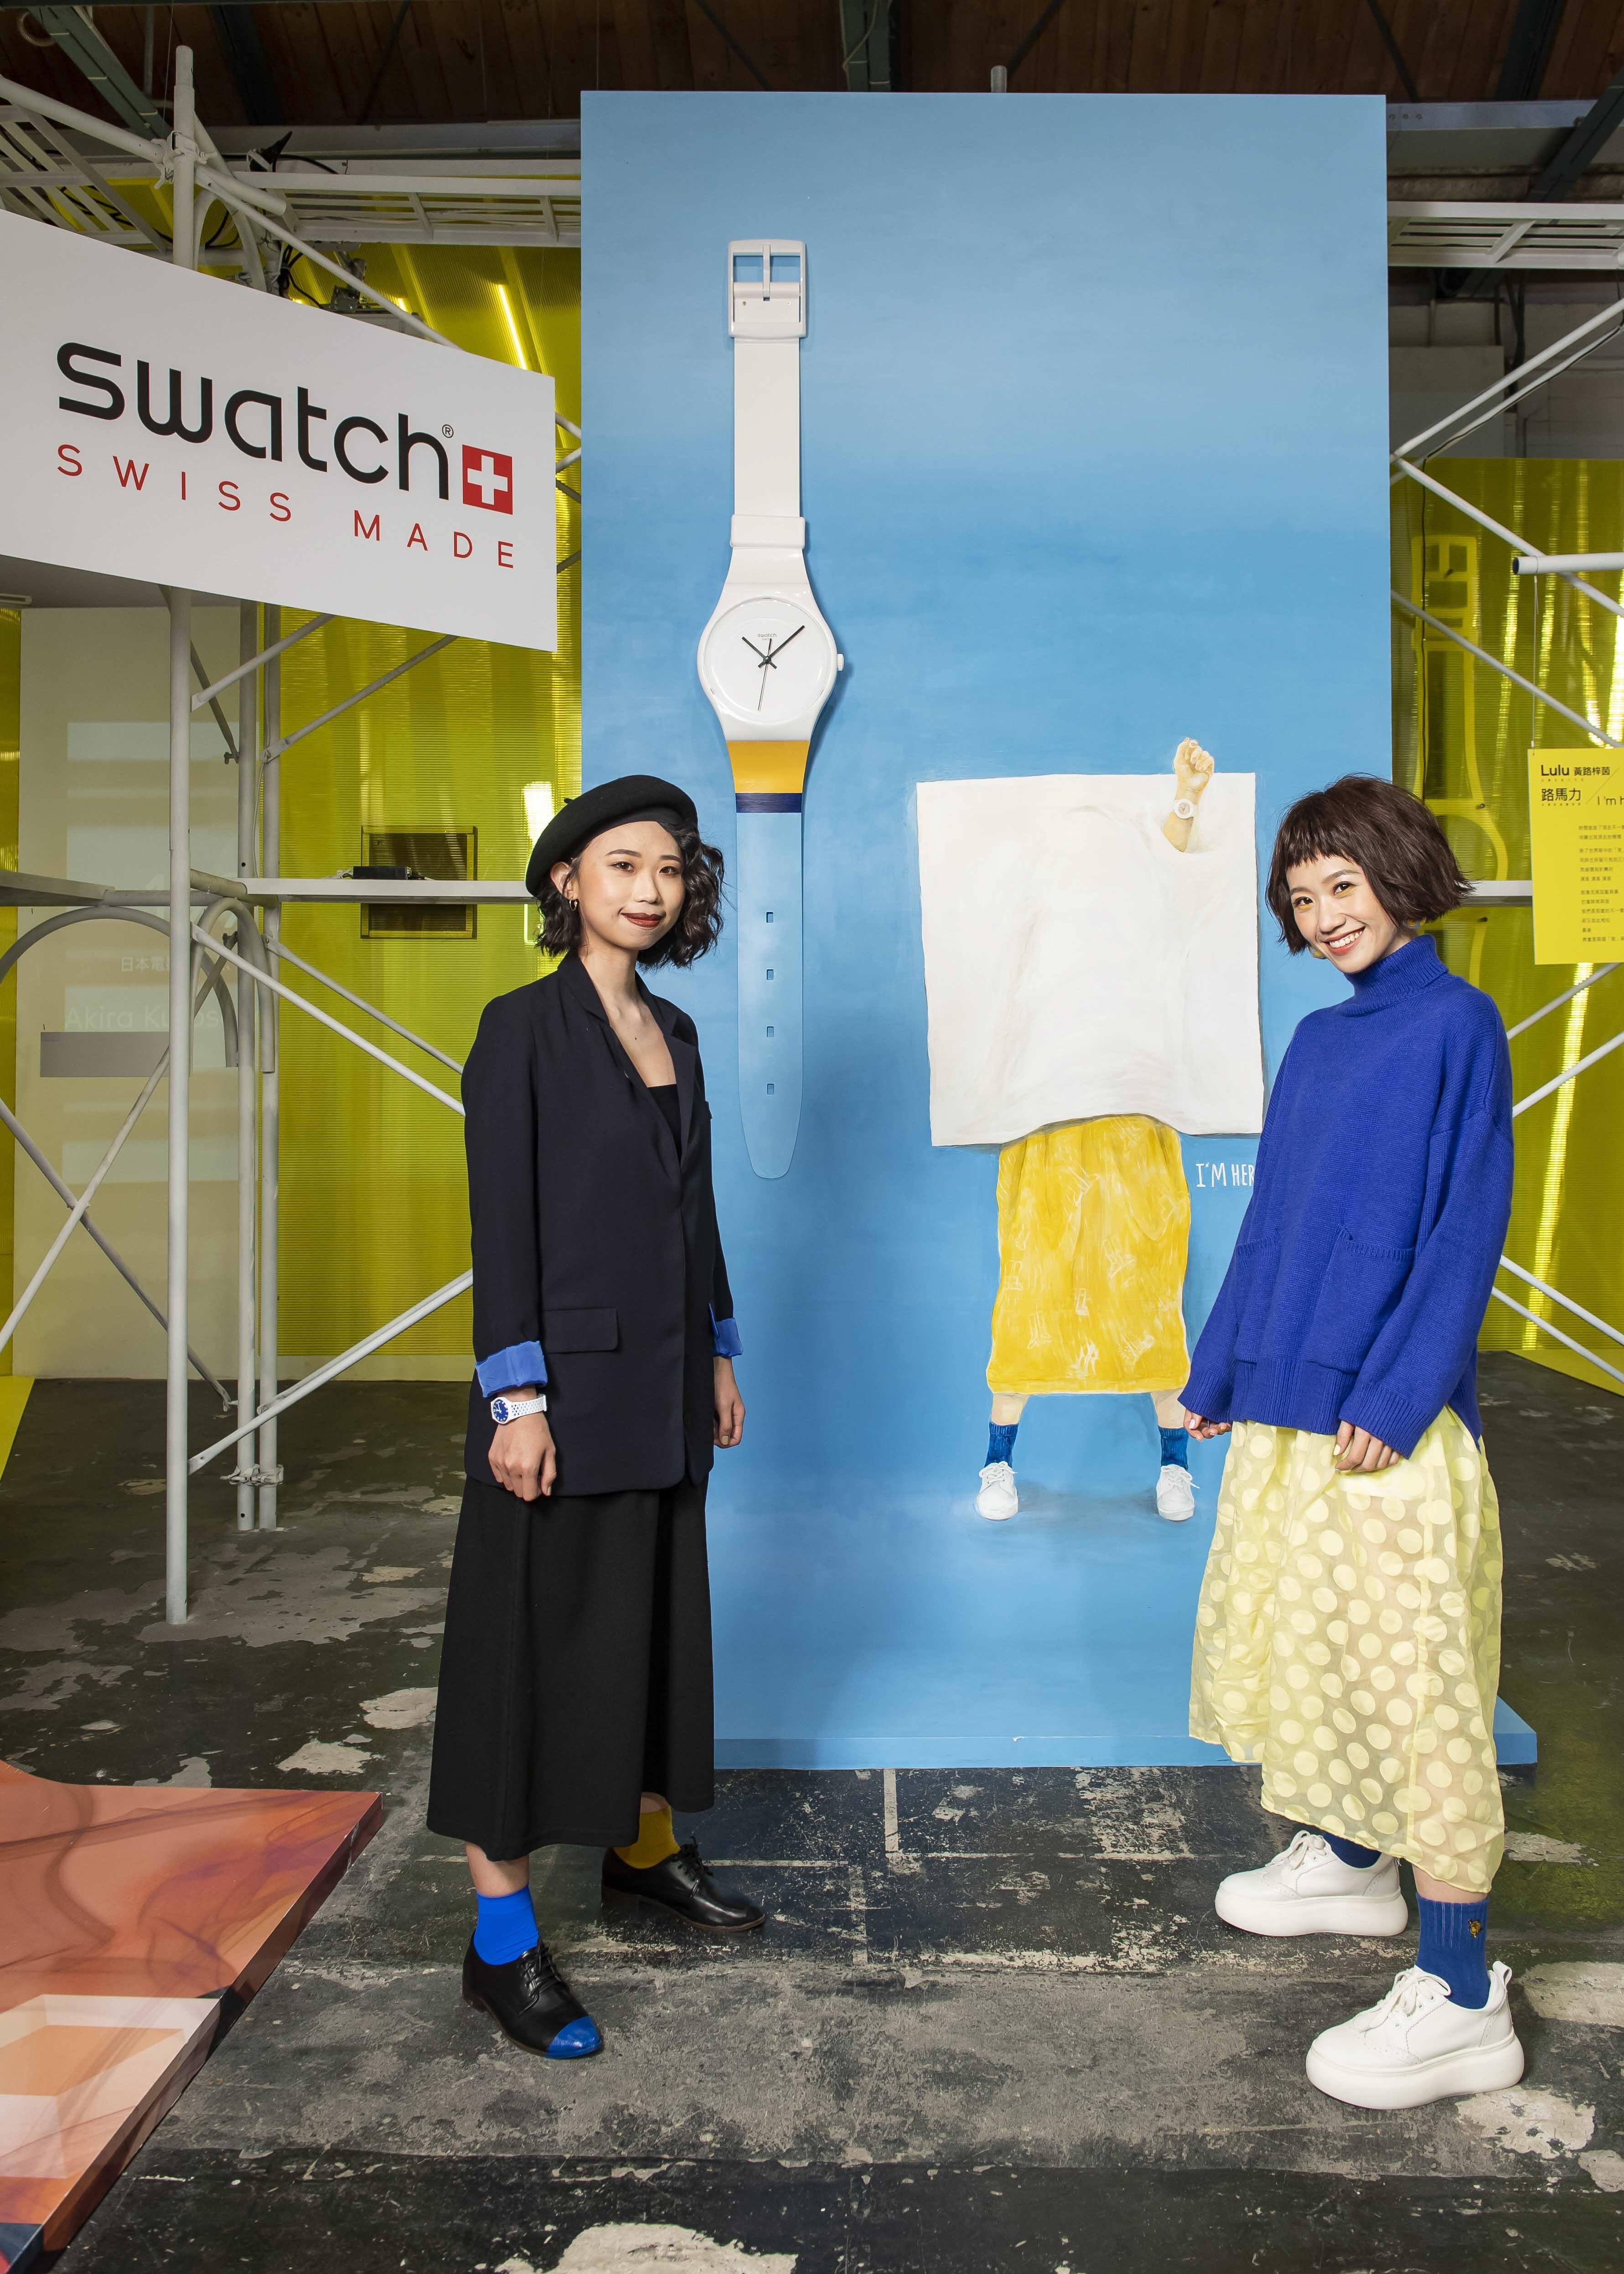 Lulu揪妹妹设计Swatch巨型表 下个目标:摩托车